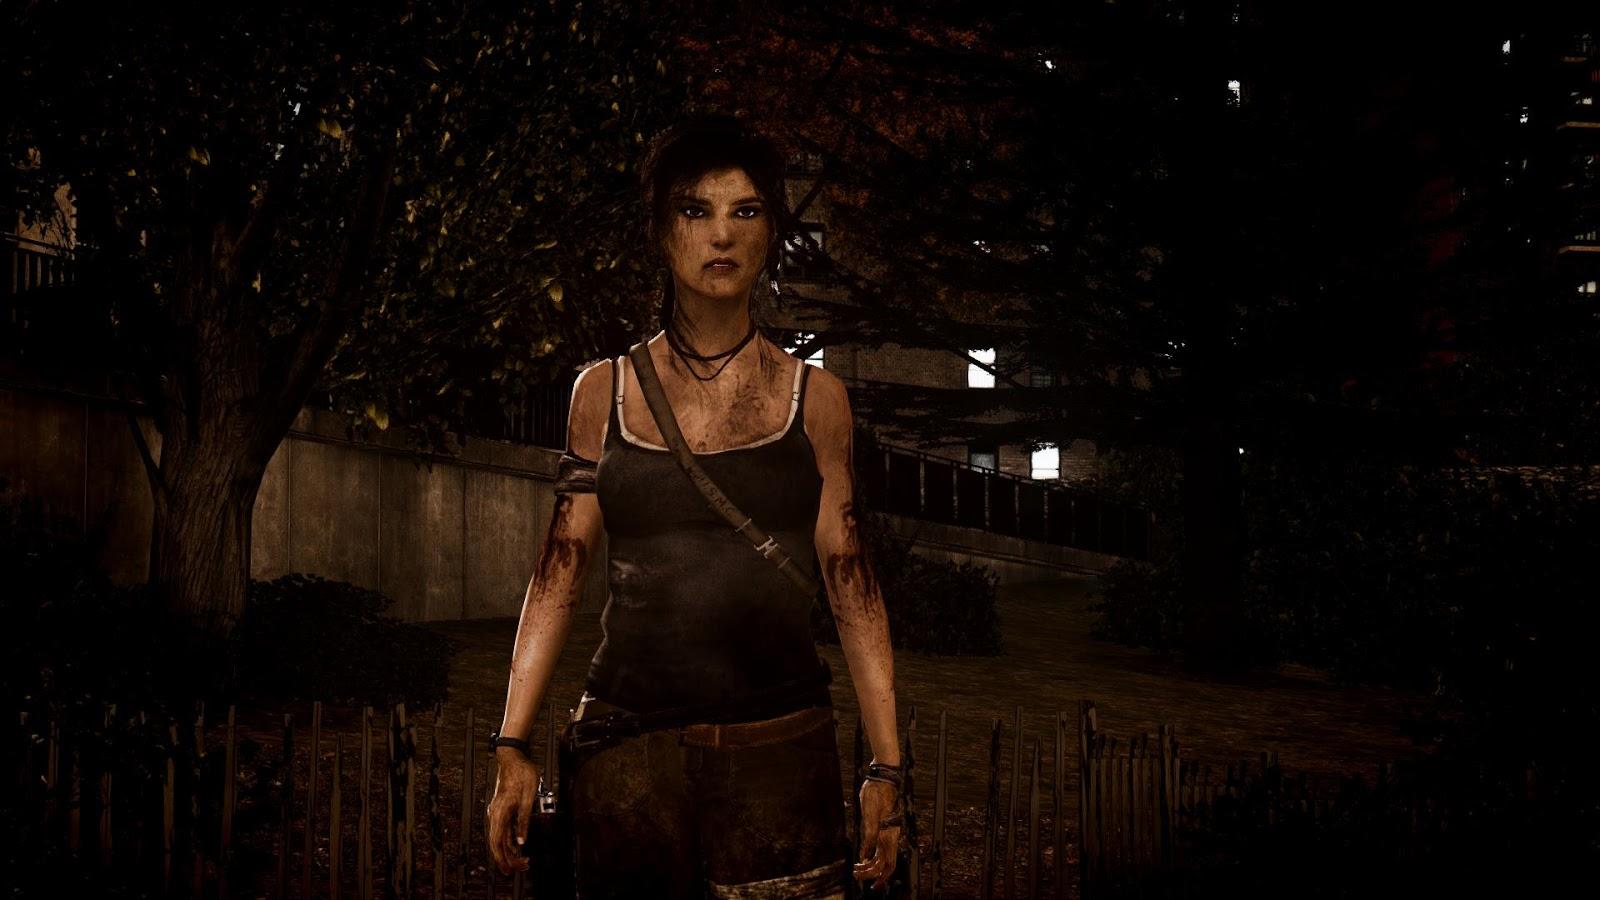 GTA 5,GTAV,GTA IV Mods and Skins: Tomb Raider 2013 Lara